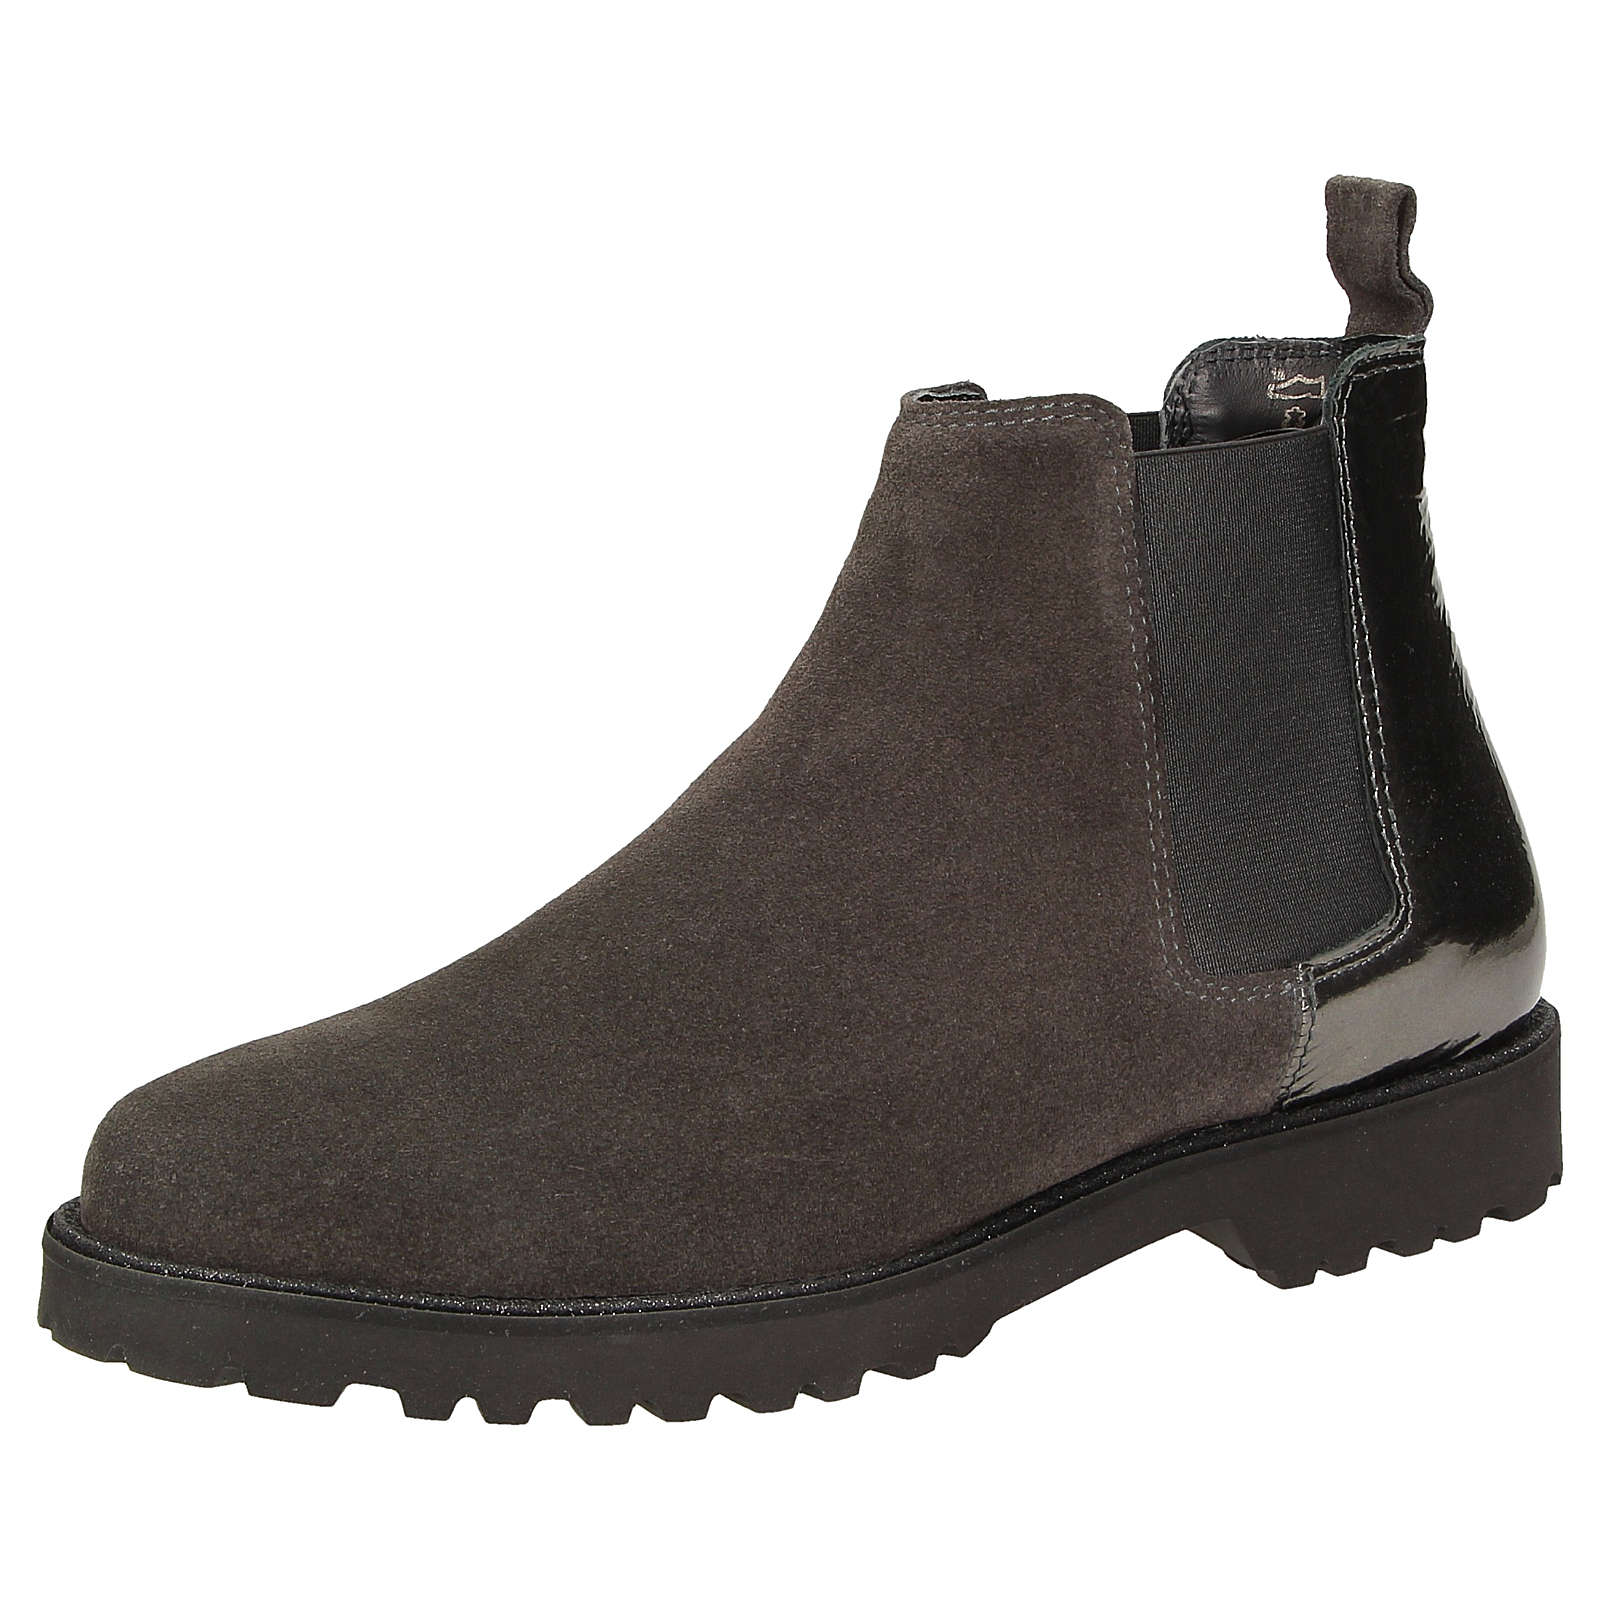 2f523ec301fc5b Rabatt-Preisvergleich.de - Schuhe   Stiefeletten   Chelsea Boots